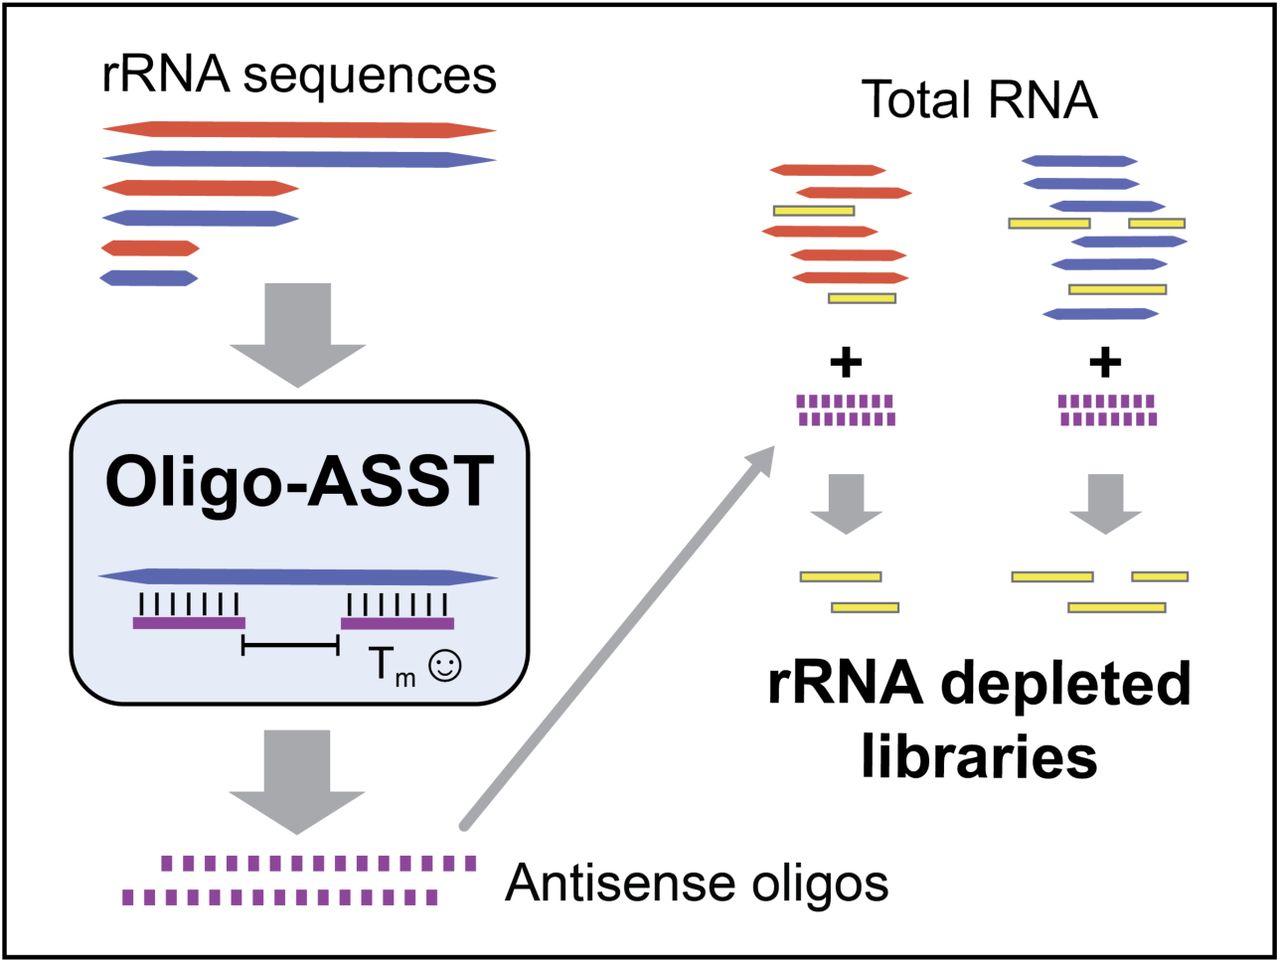 Optimized Design Of Antisense Oligomers For Targeted Rrna Depletion Biorxiv